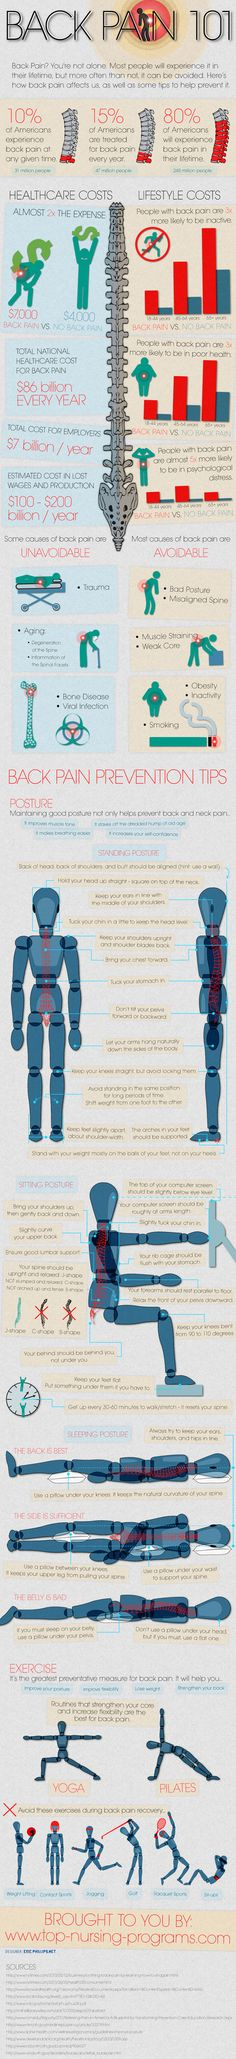 Back Pain 101 (Infographic) theyogablog.com